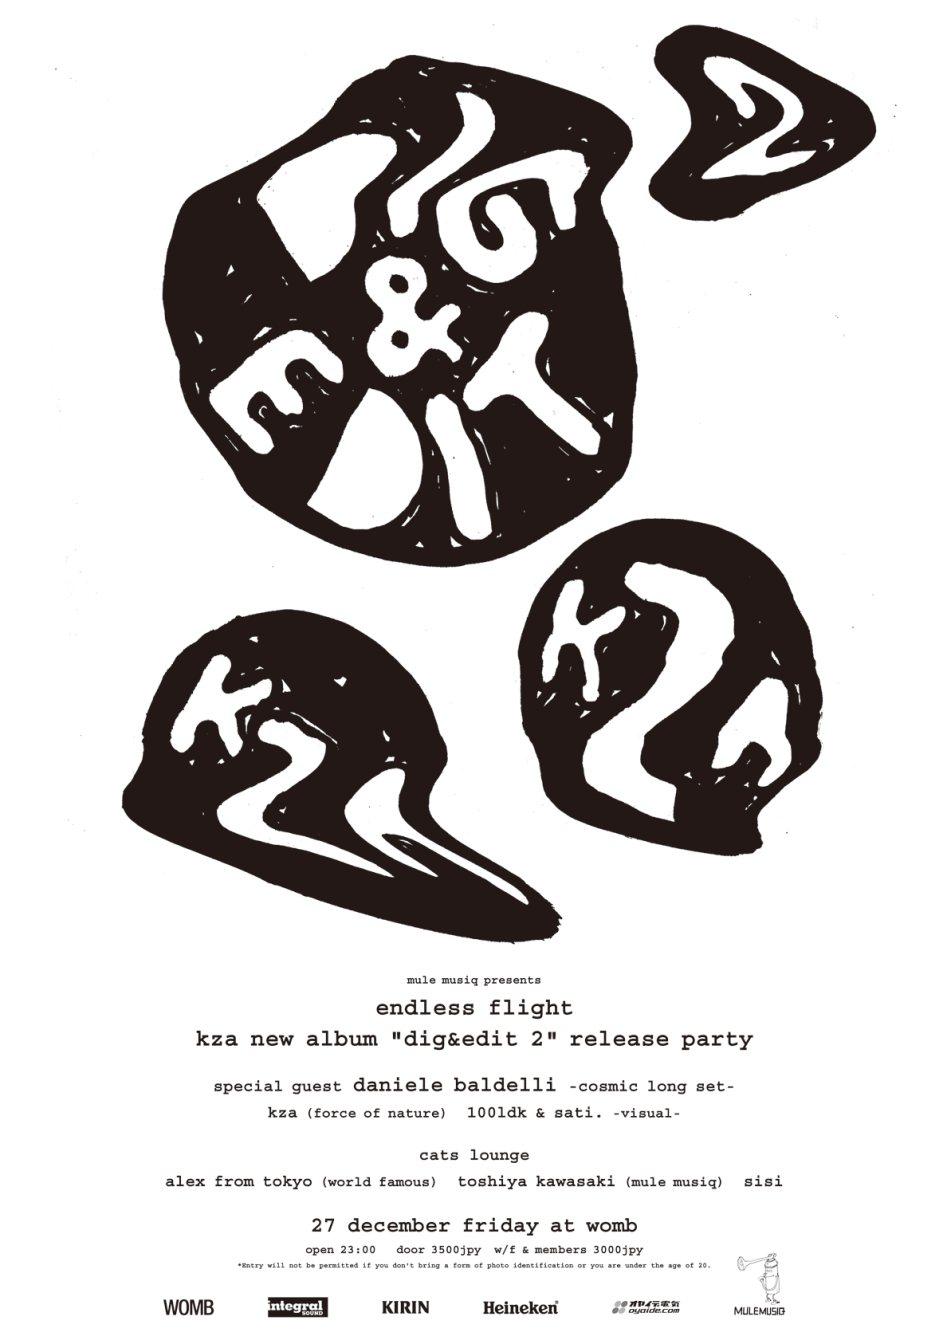 Endless Flight Feat.Daniele Baldelli -KZA New Album 'Dig&edit2' Release Party- - Flyer front